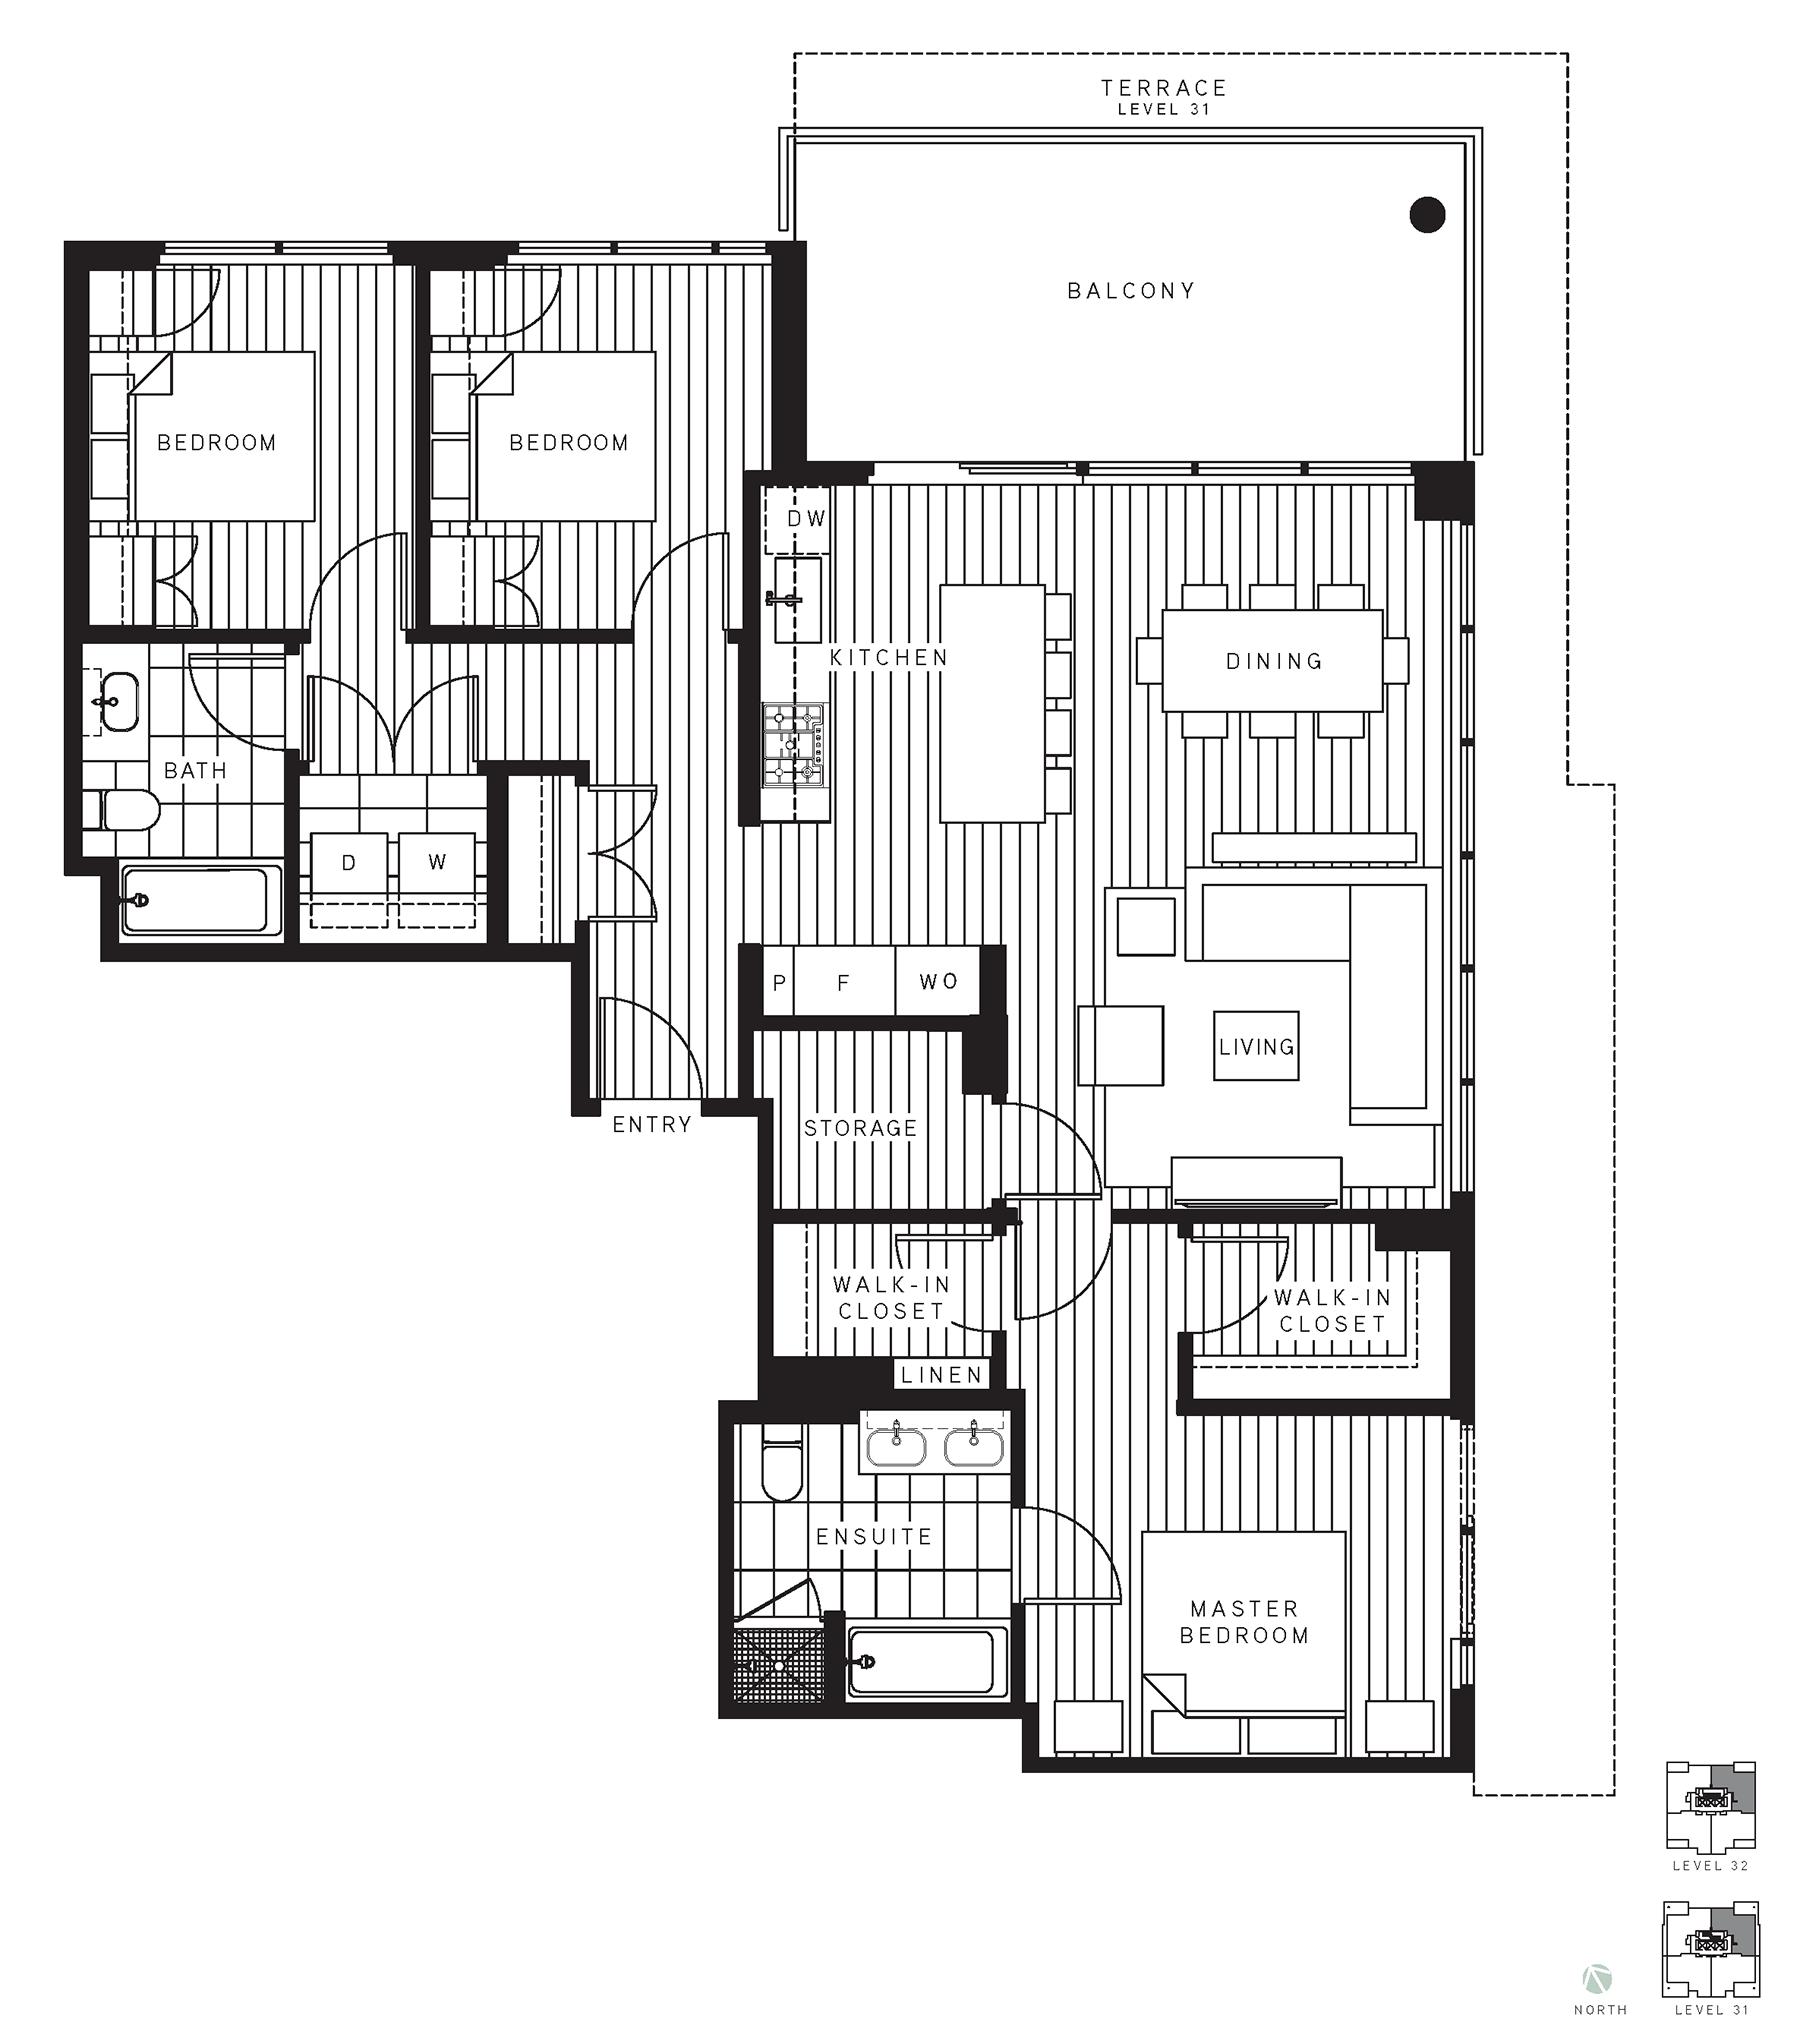 Maywood Floorplan PH1